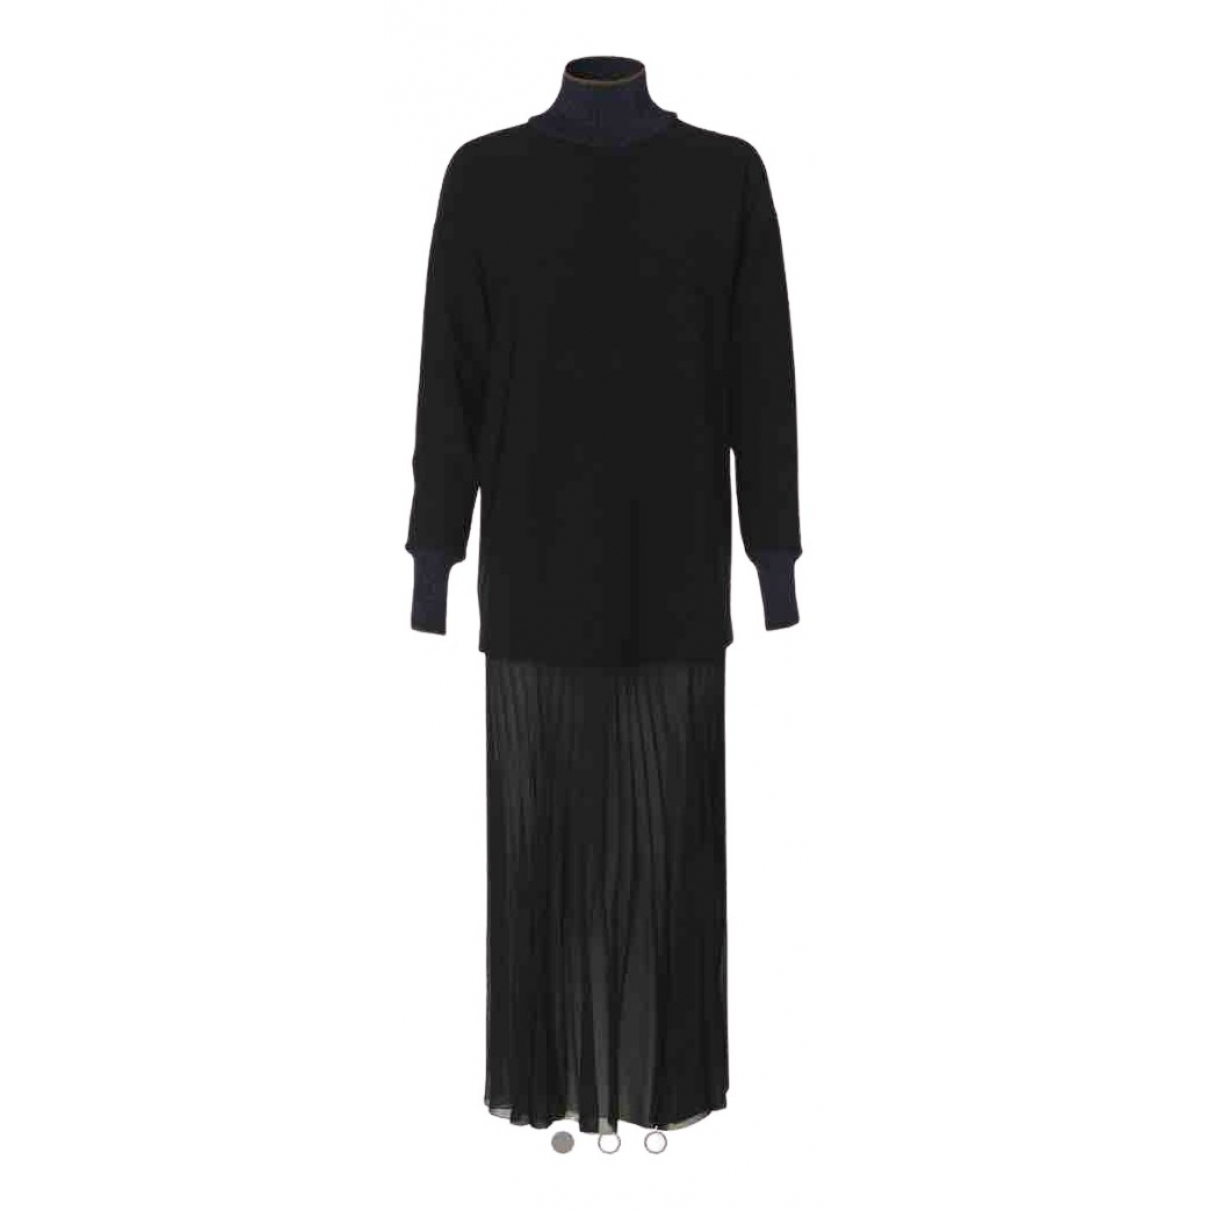 By Malene Birger - Robe   pour femme en coton - elasthane - noir